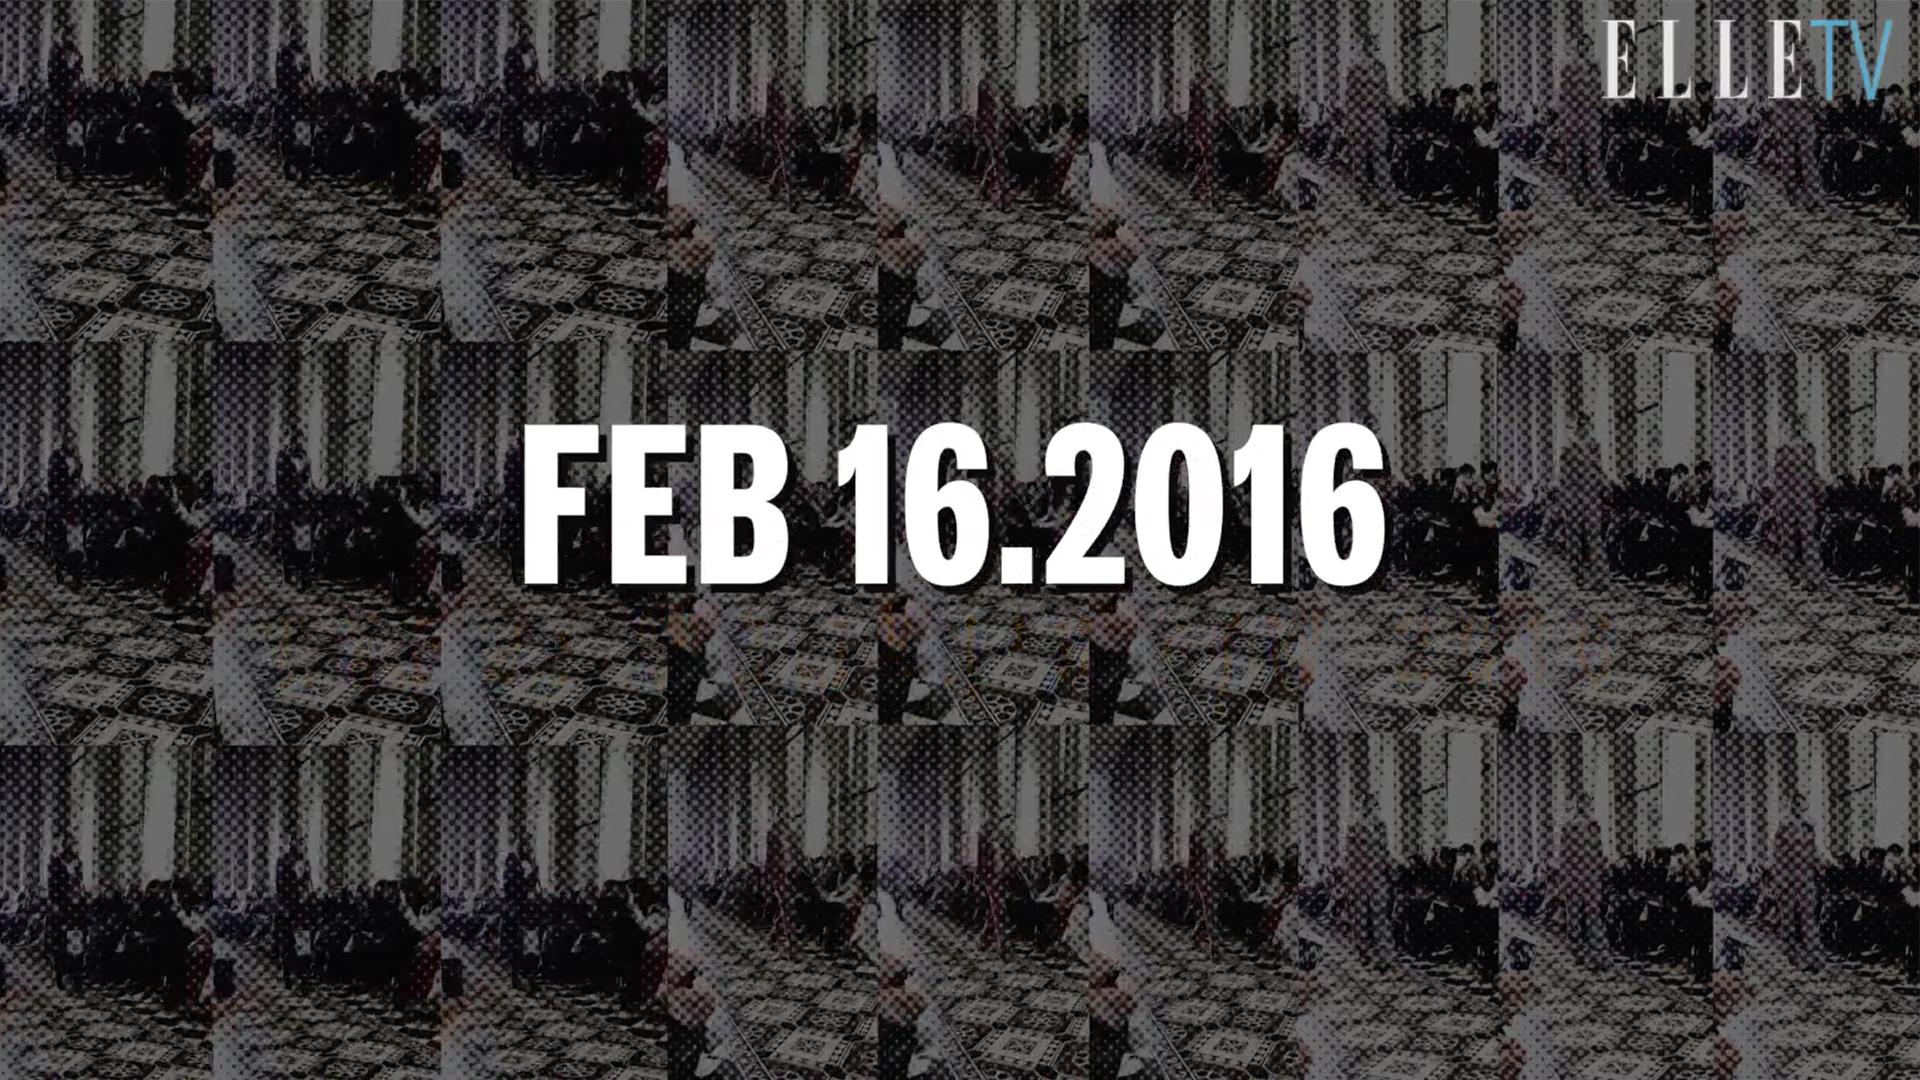 [ELLE SHOW TIME] 2016 F/W 뉴욕 패션 위크 2월16일 리포트